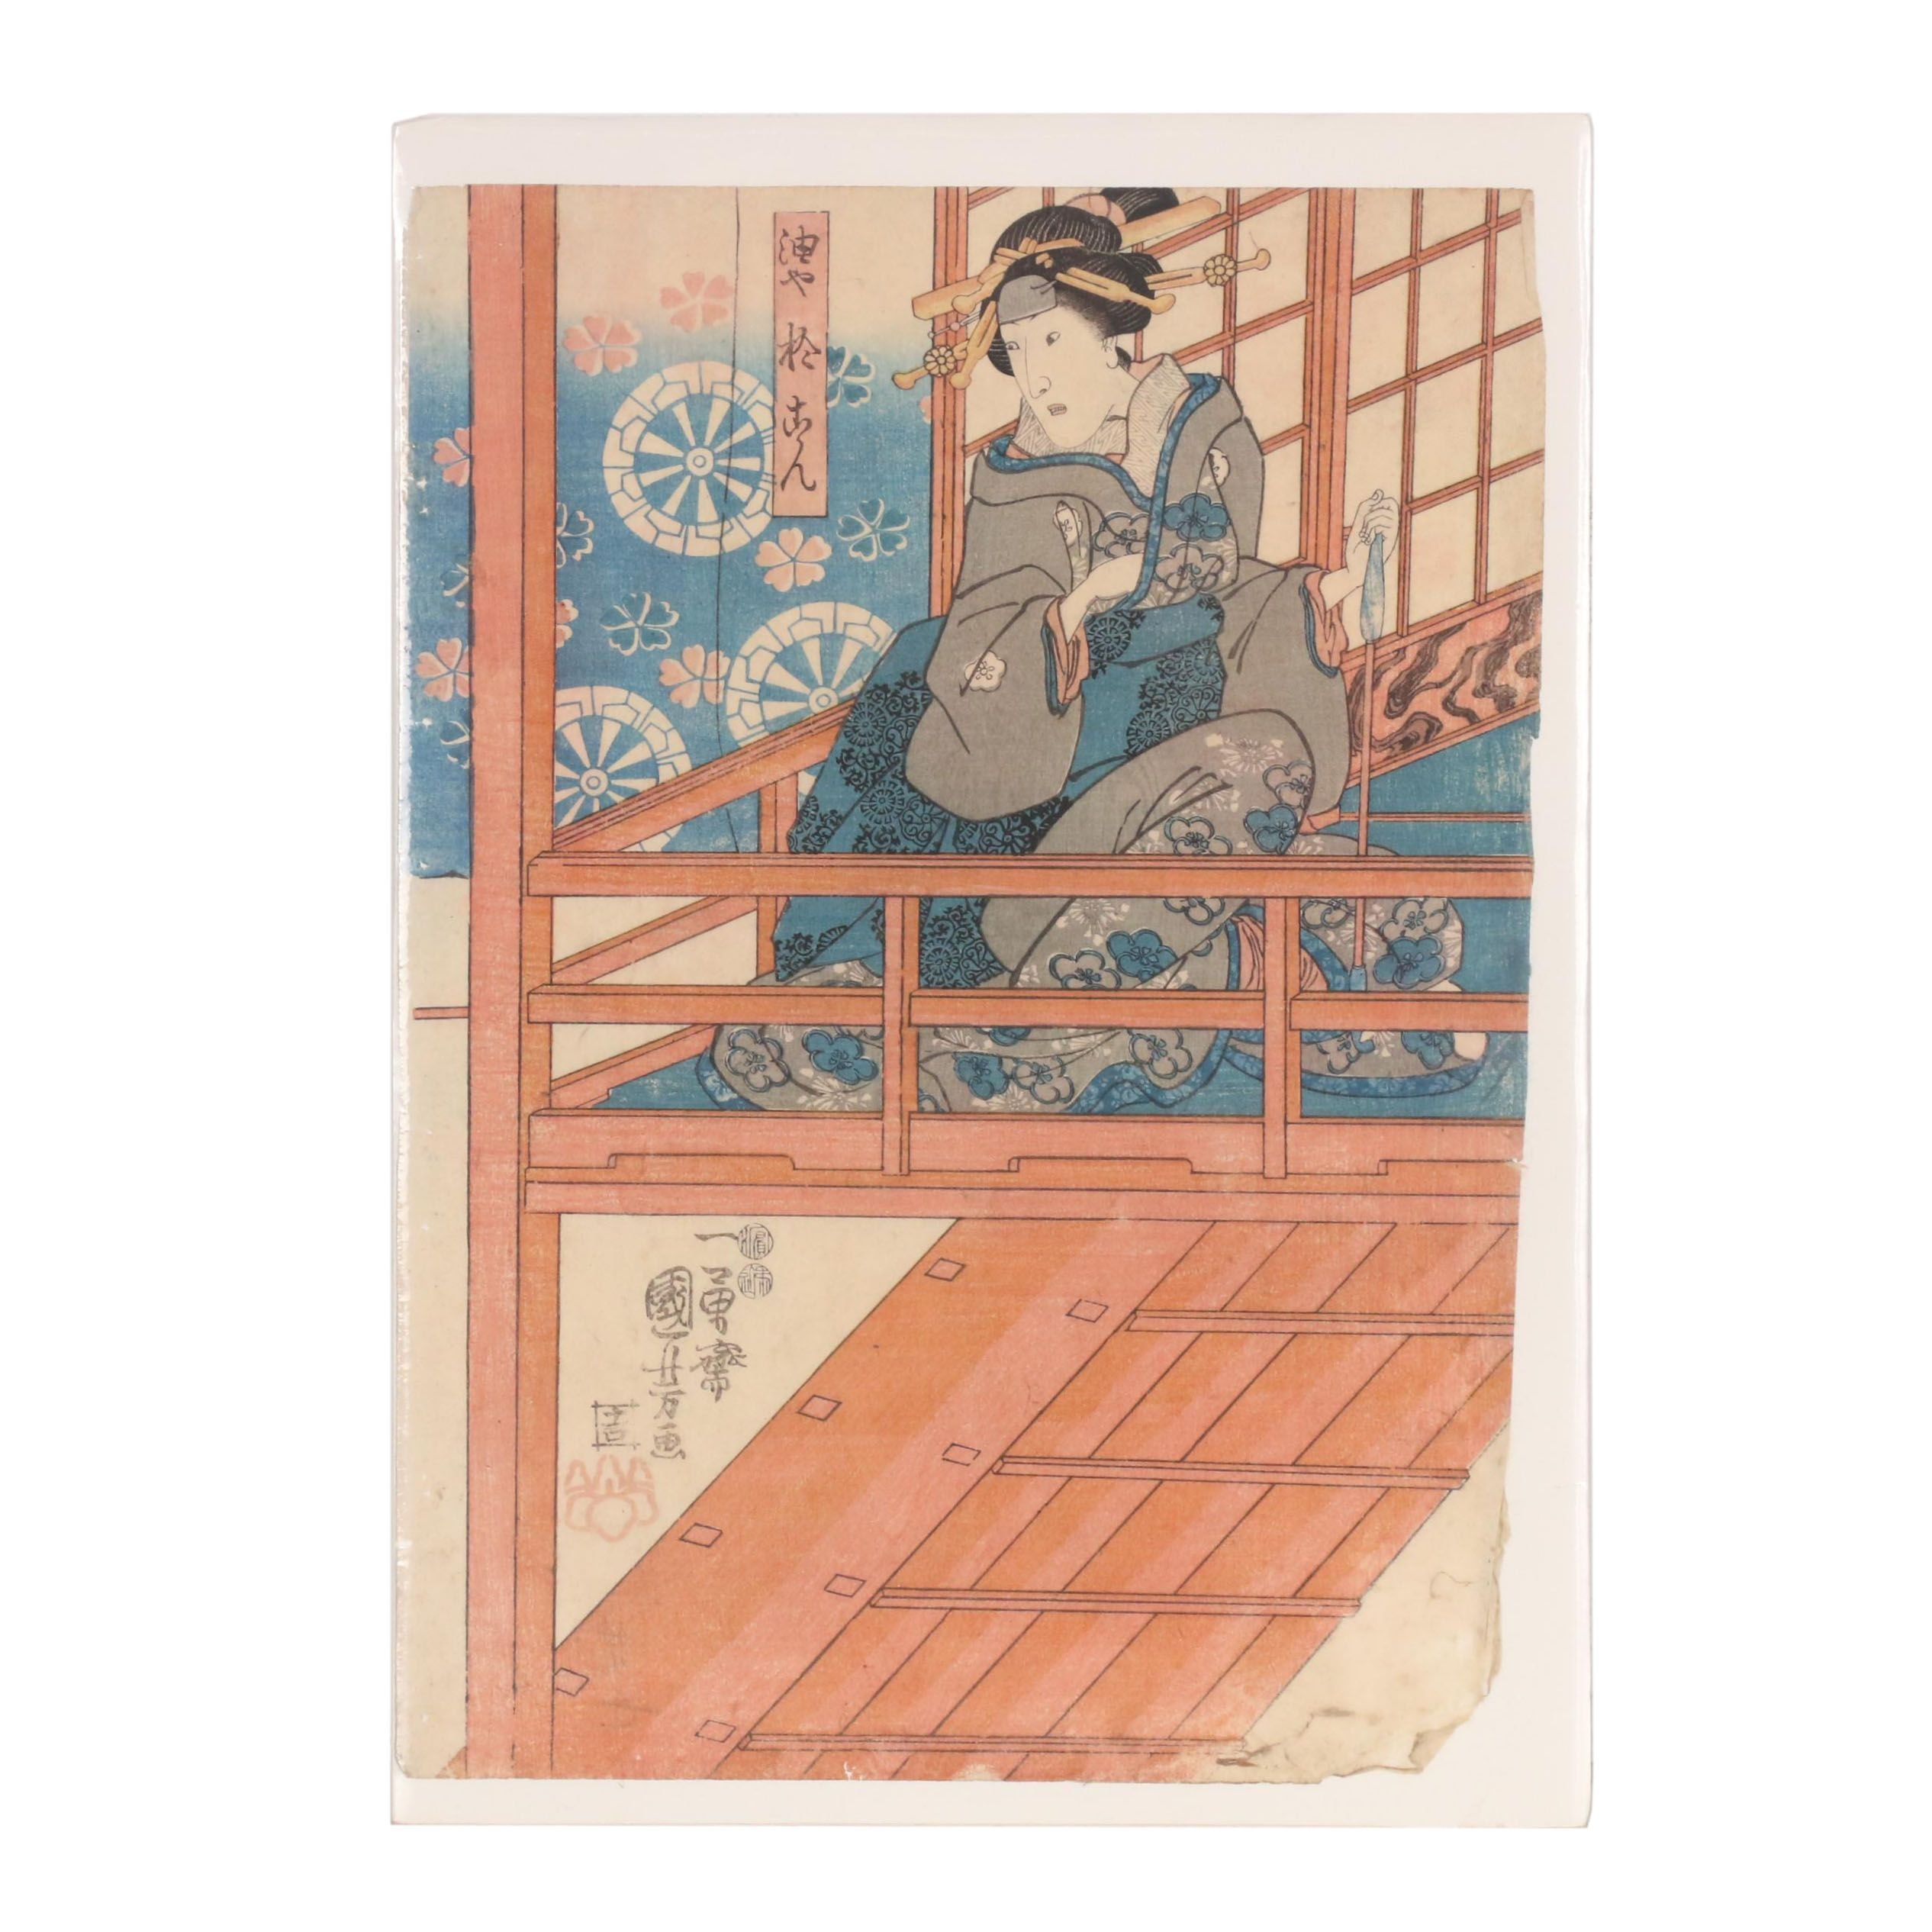 Utagawa Kuniyoshi Ukiyo-e Woodblock Print